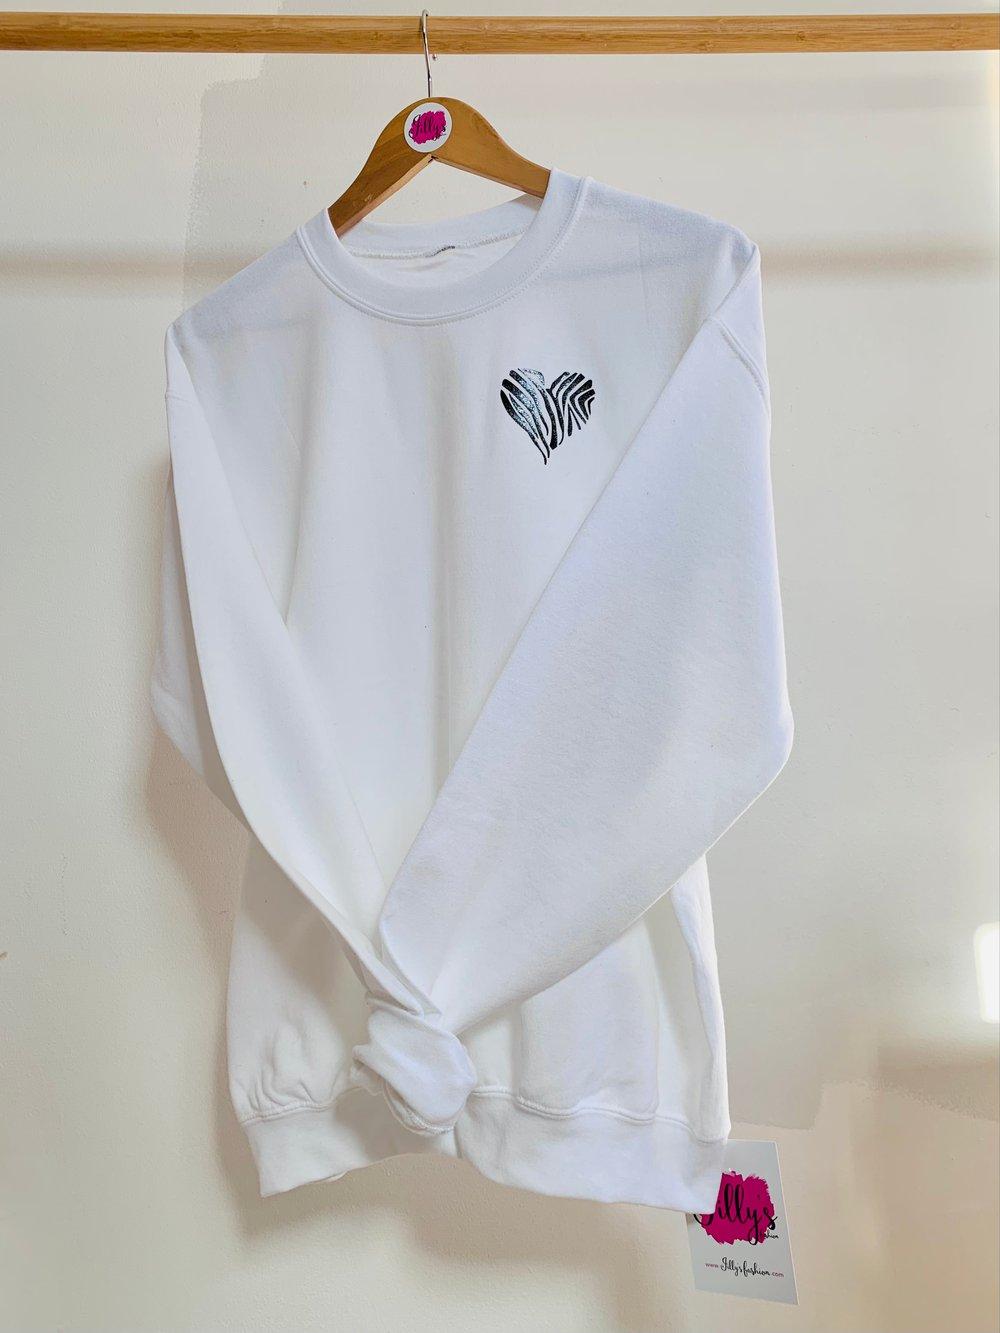 Havanaa heart sweater - adult